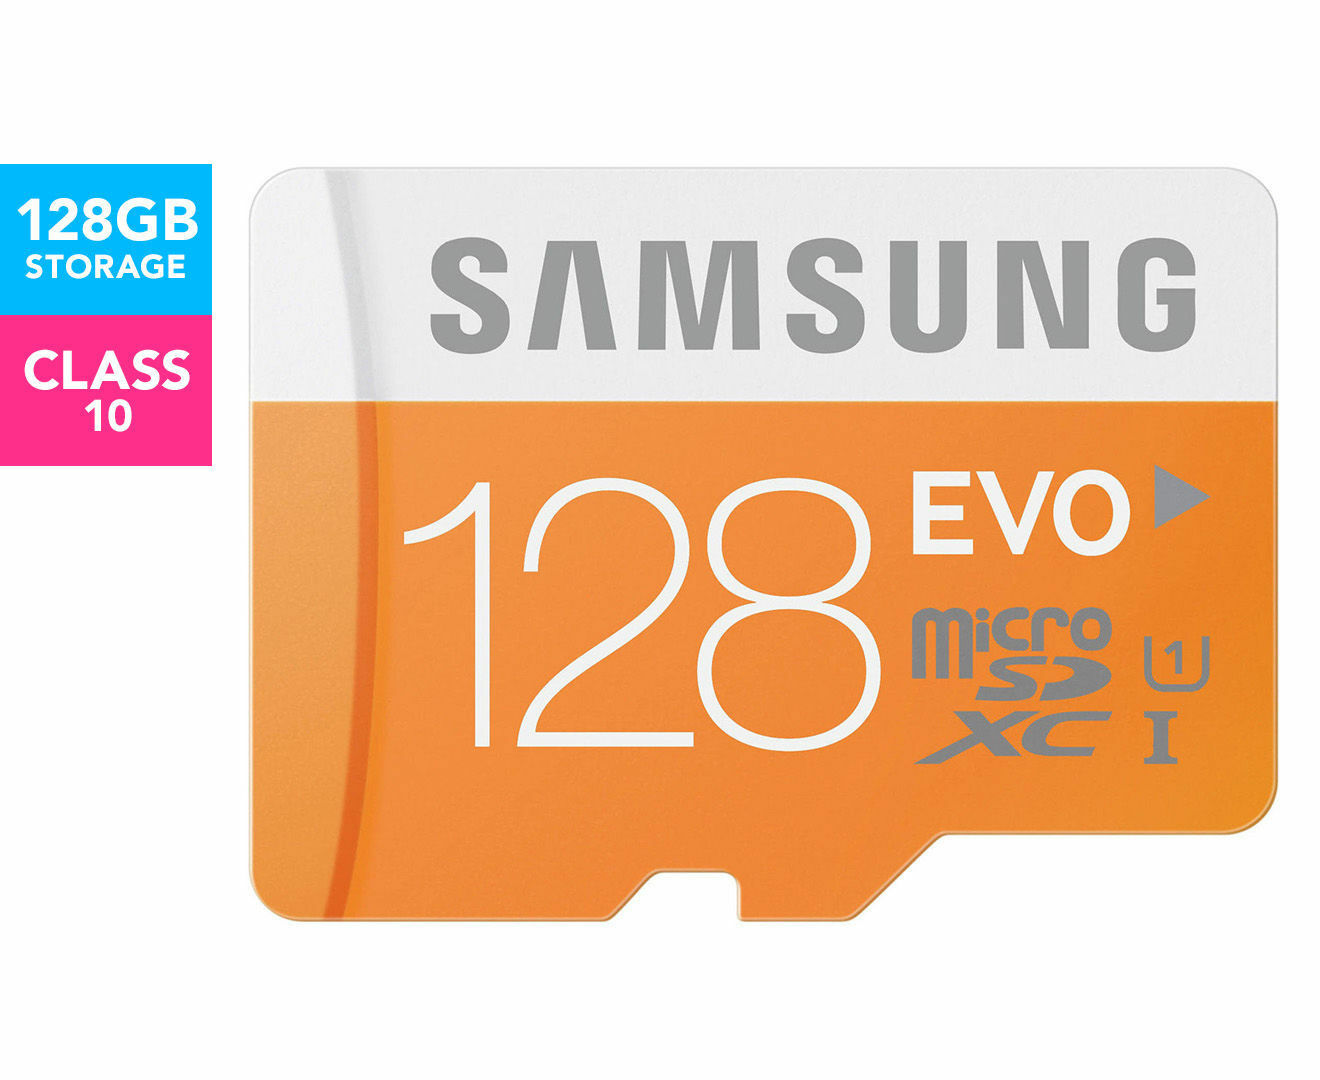 SAMSUNG 128GB EVO Micro SD Memory Card Class 10 48 MB/S Galaxy